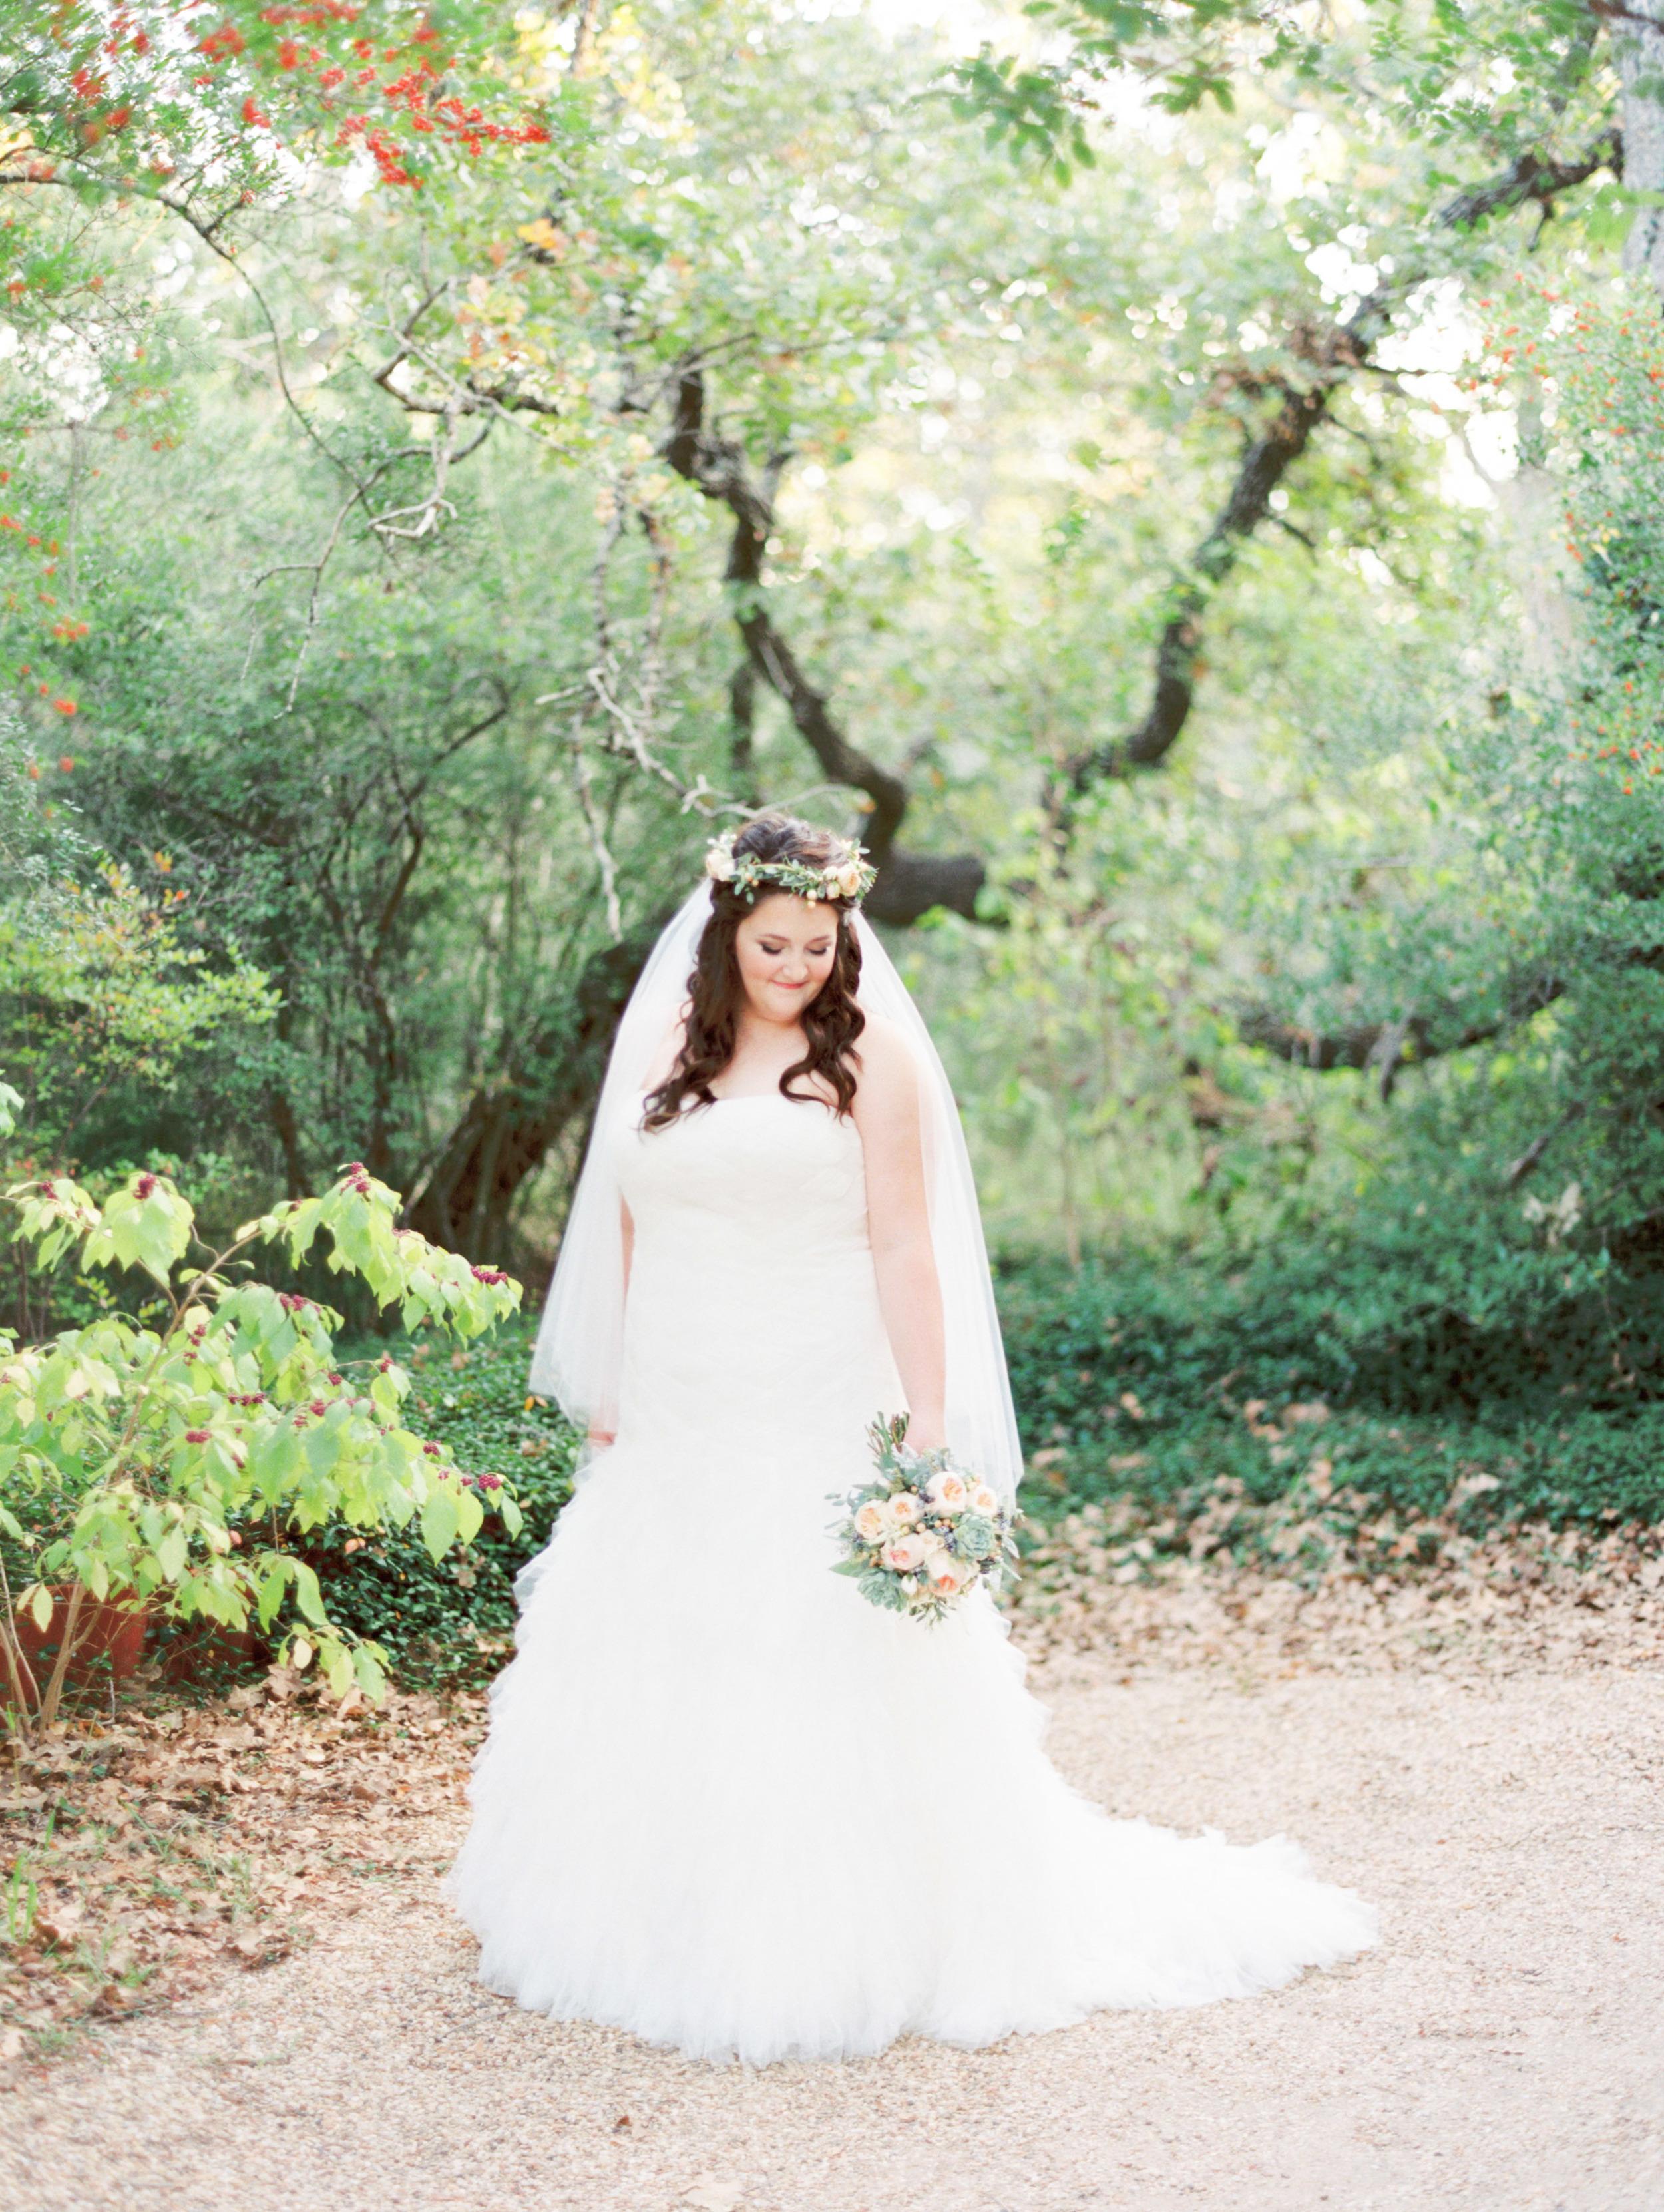 Sarah Best Photography - Elizabeth's Bridals - 7F Lodge-123.jpg